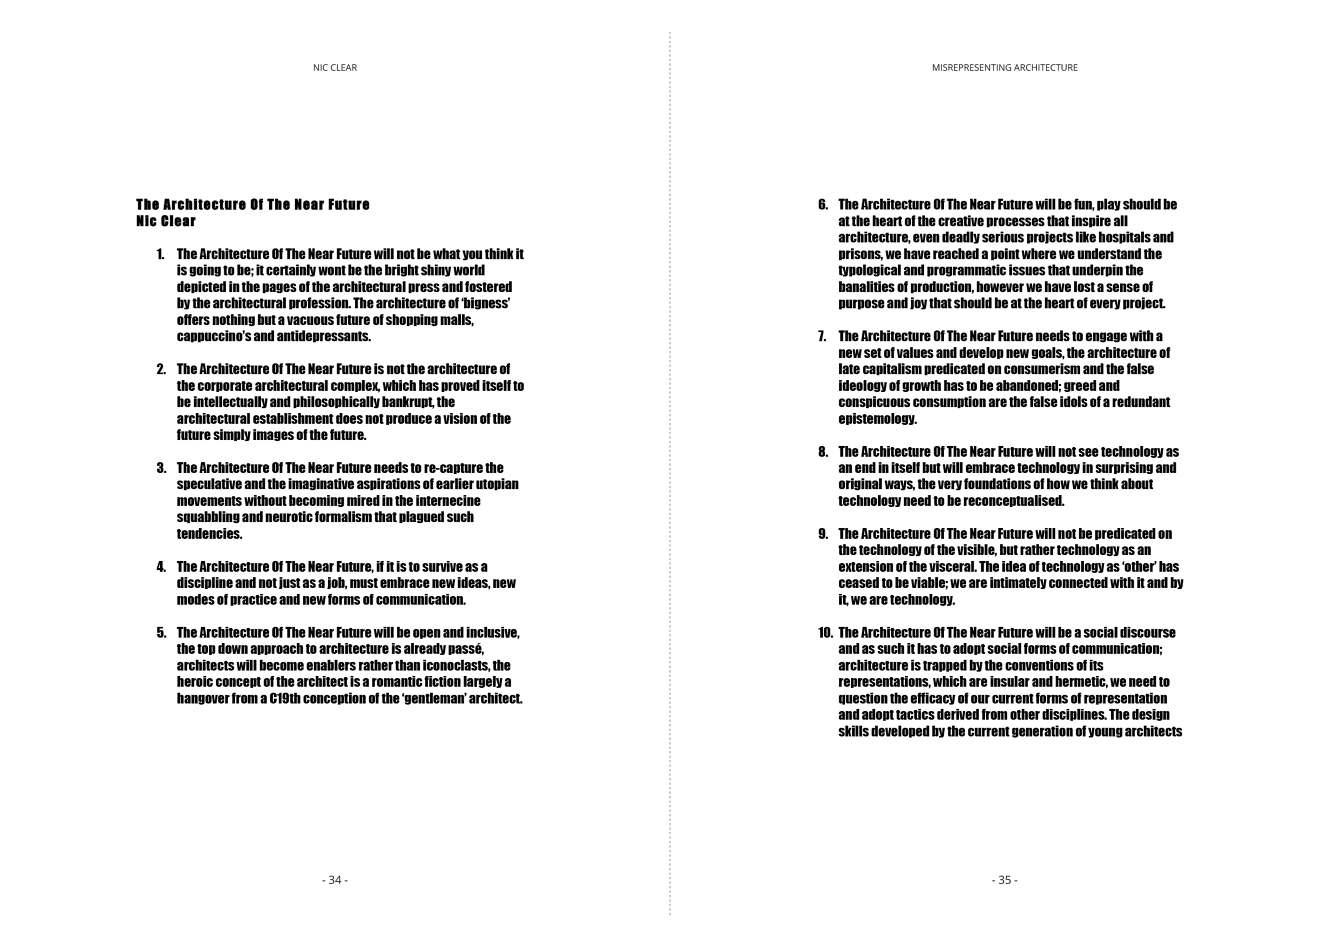 Misrepresenting Architecture - Professor Nic Clear